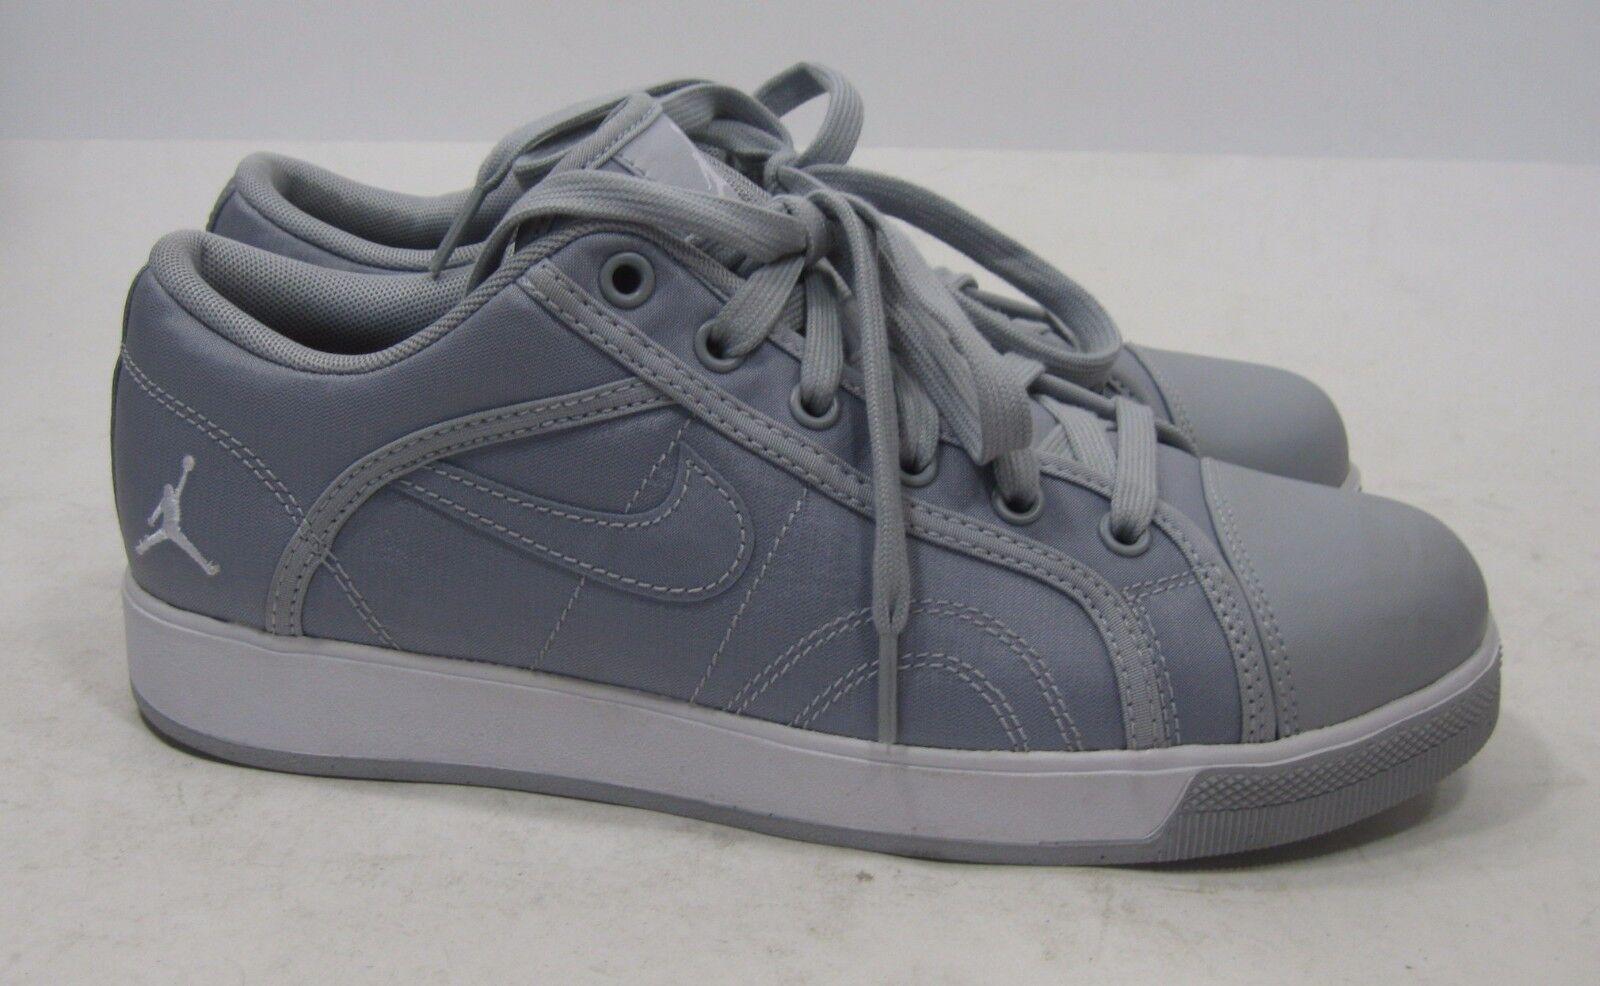 Nike Air Jordan 440988-002 Sky High Retro Mens Basketball shoes Size 8.5